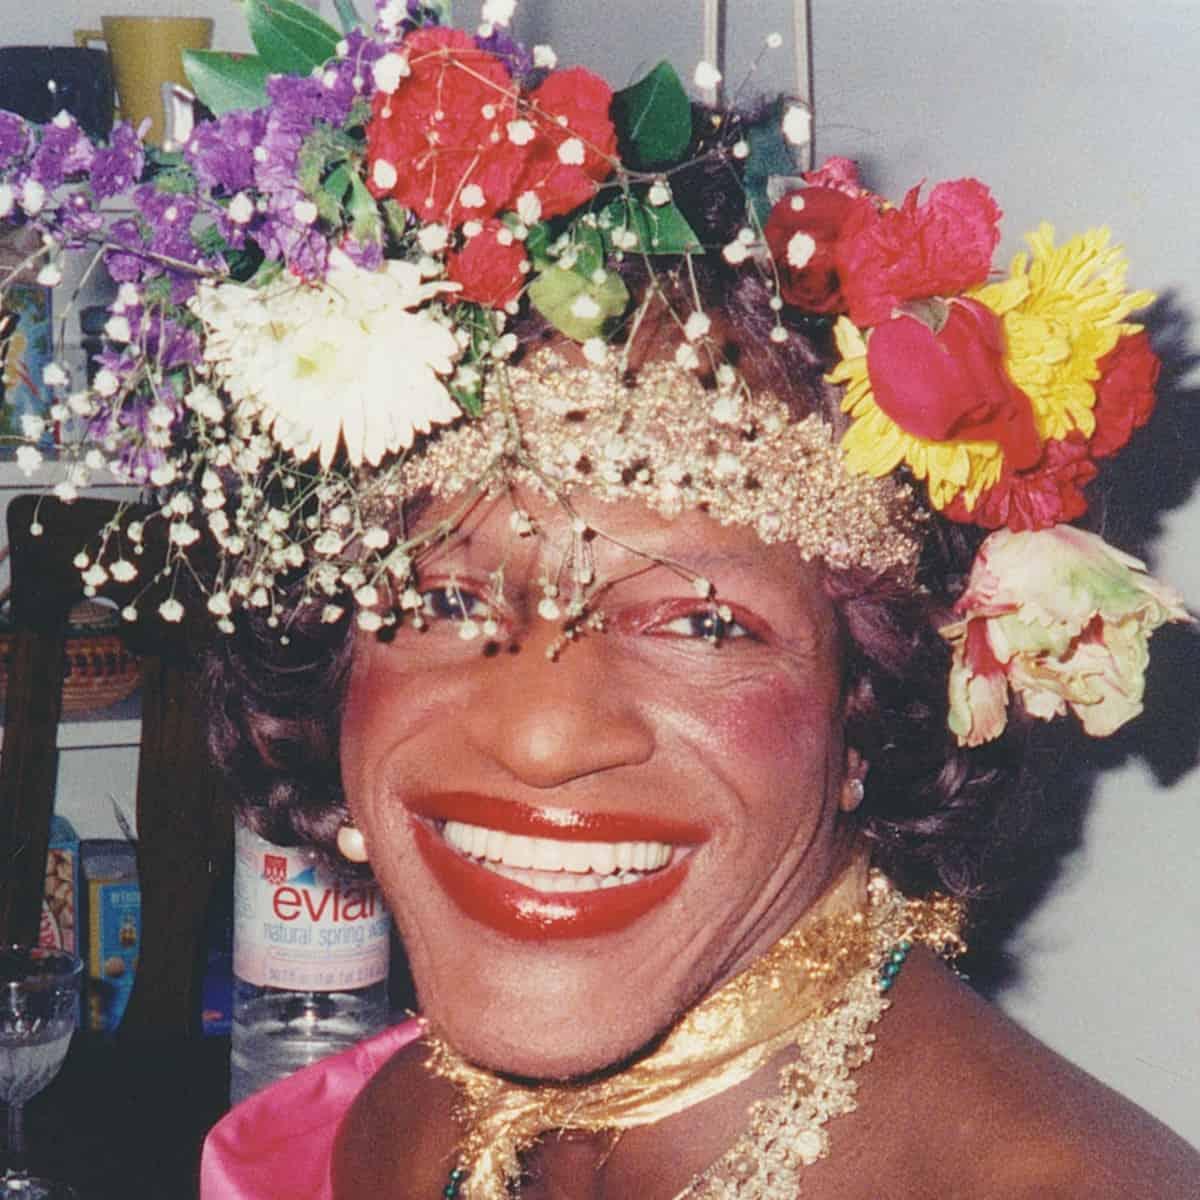 Marsha P Johnson, Hay una lesbiana en mi sopa